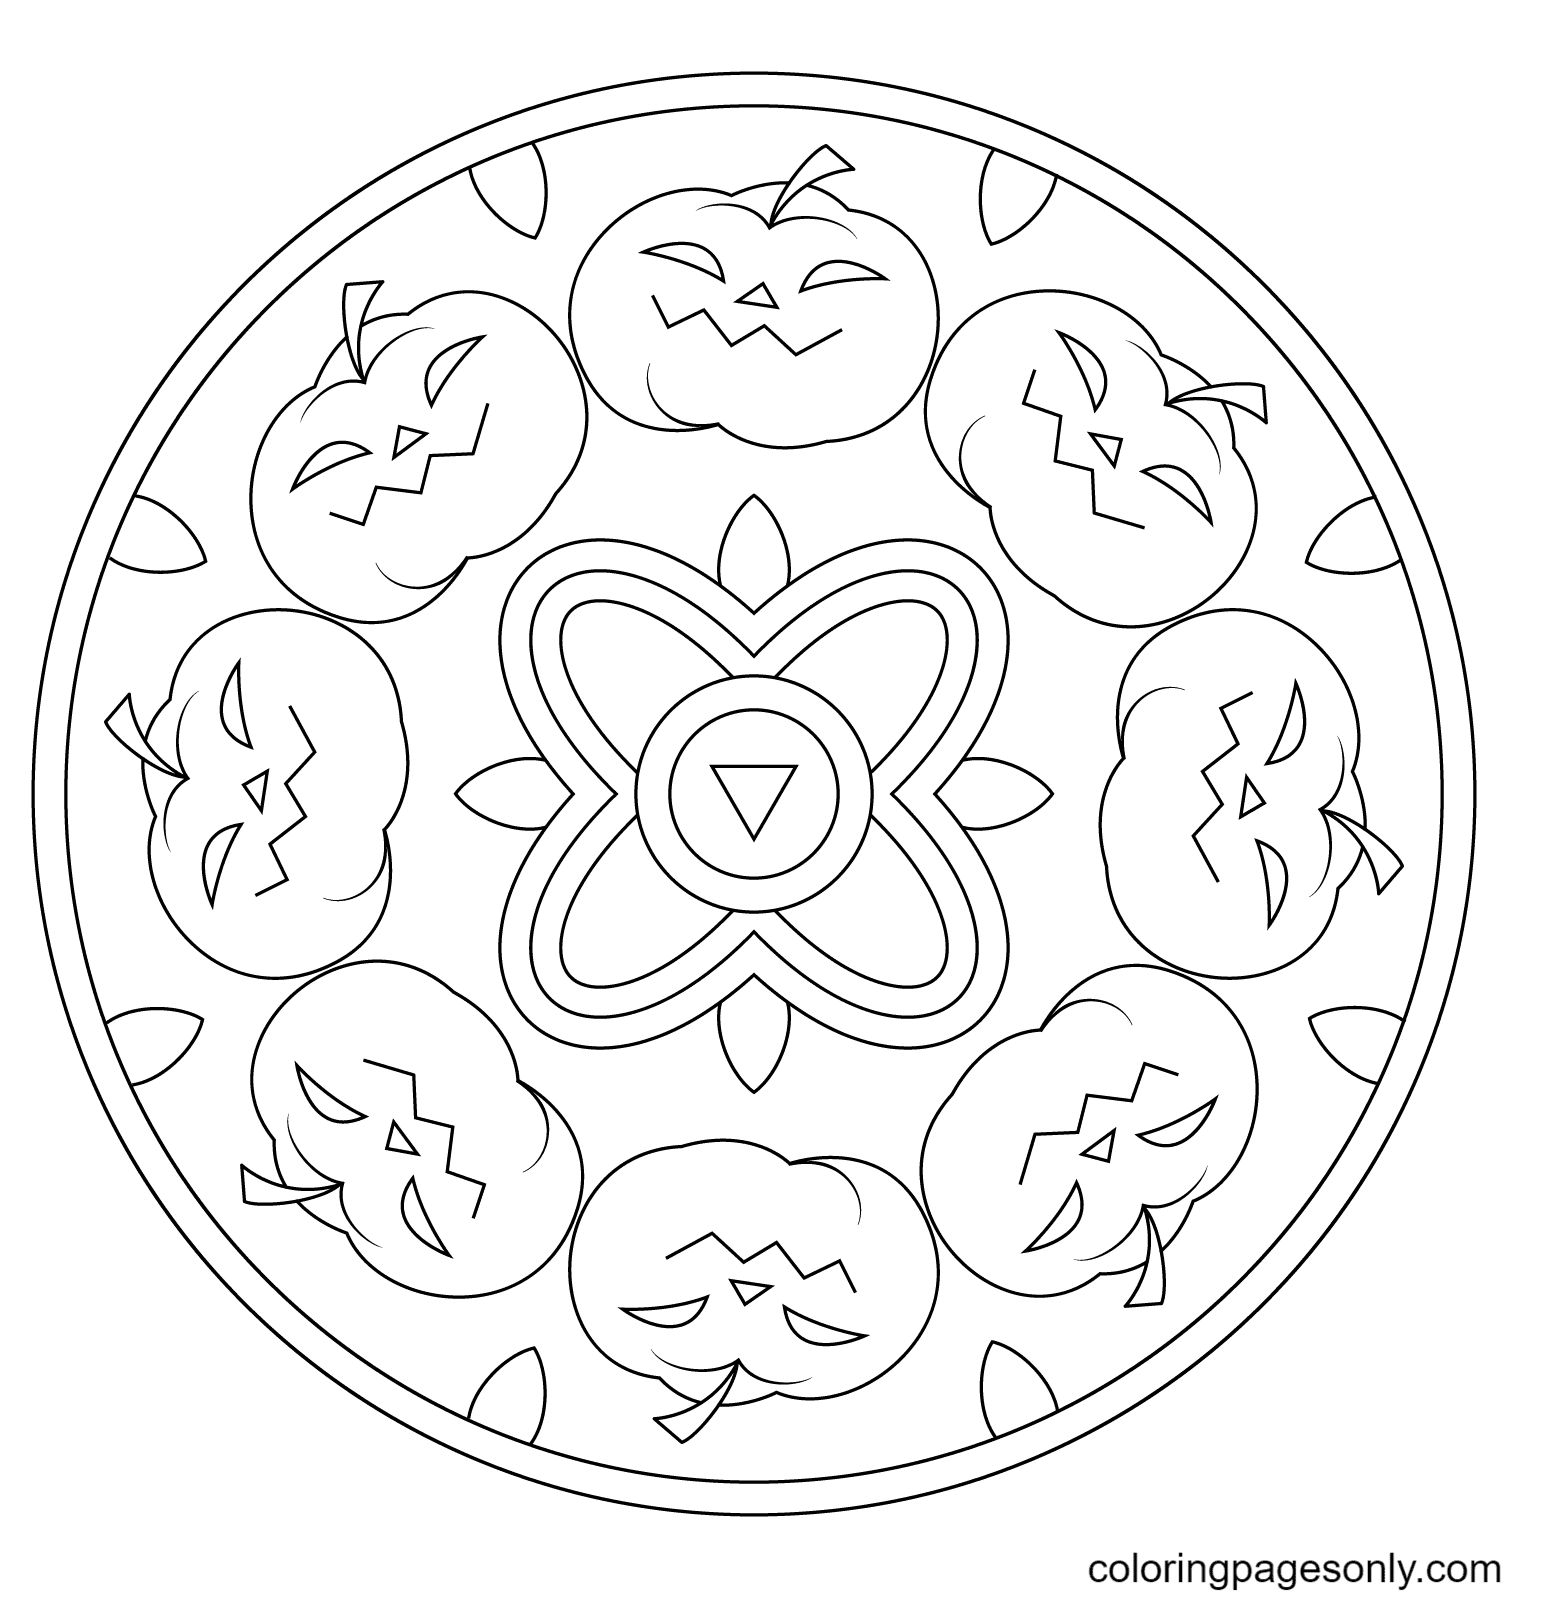 Halloween Mandala with Pumpkins Coloring Page